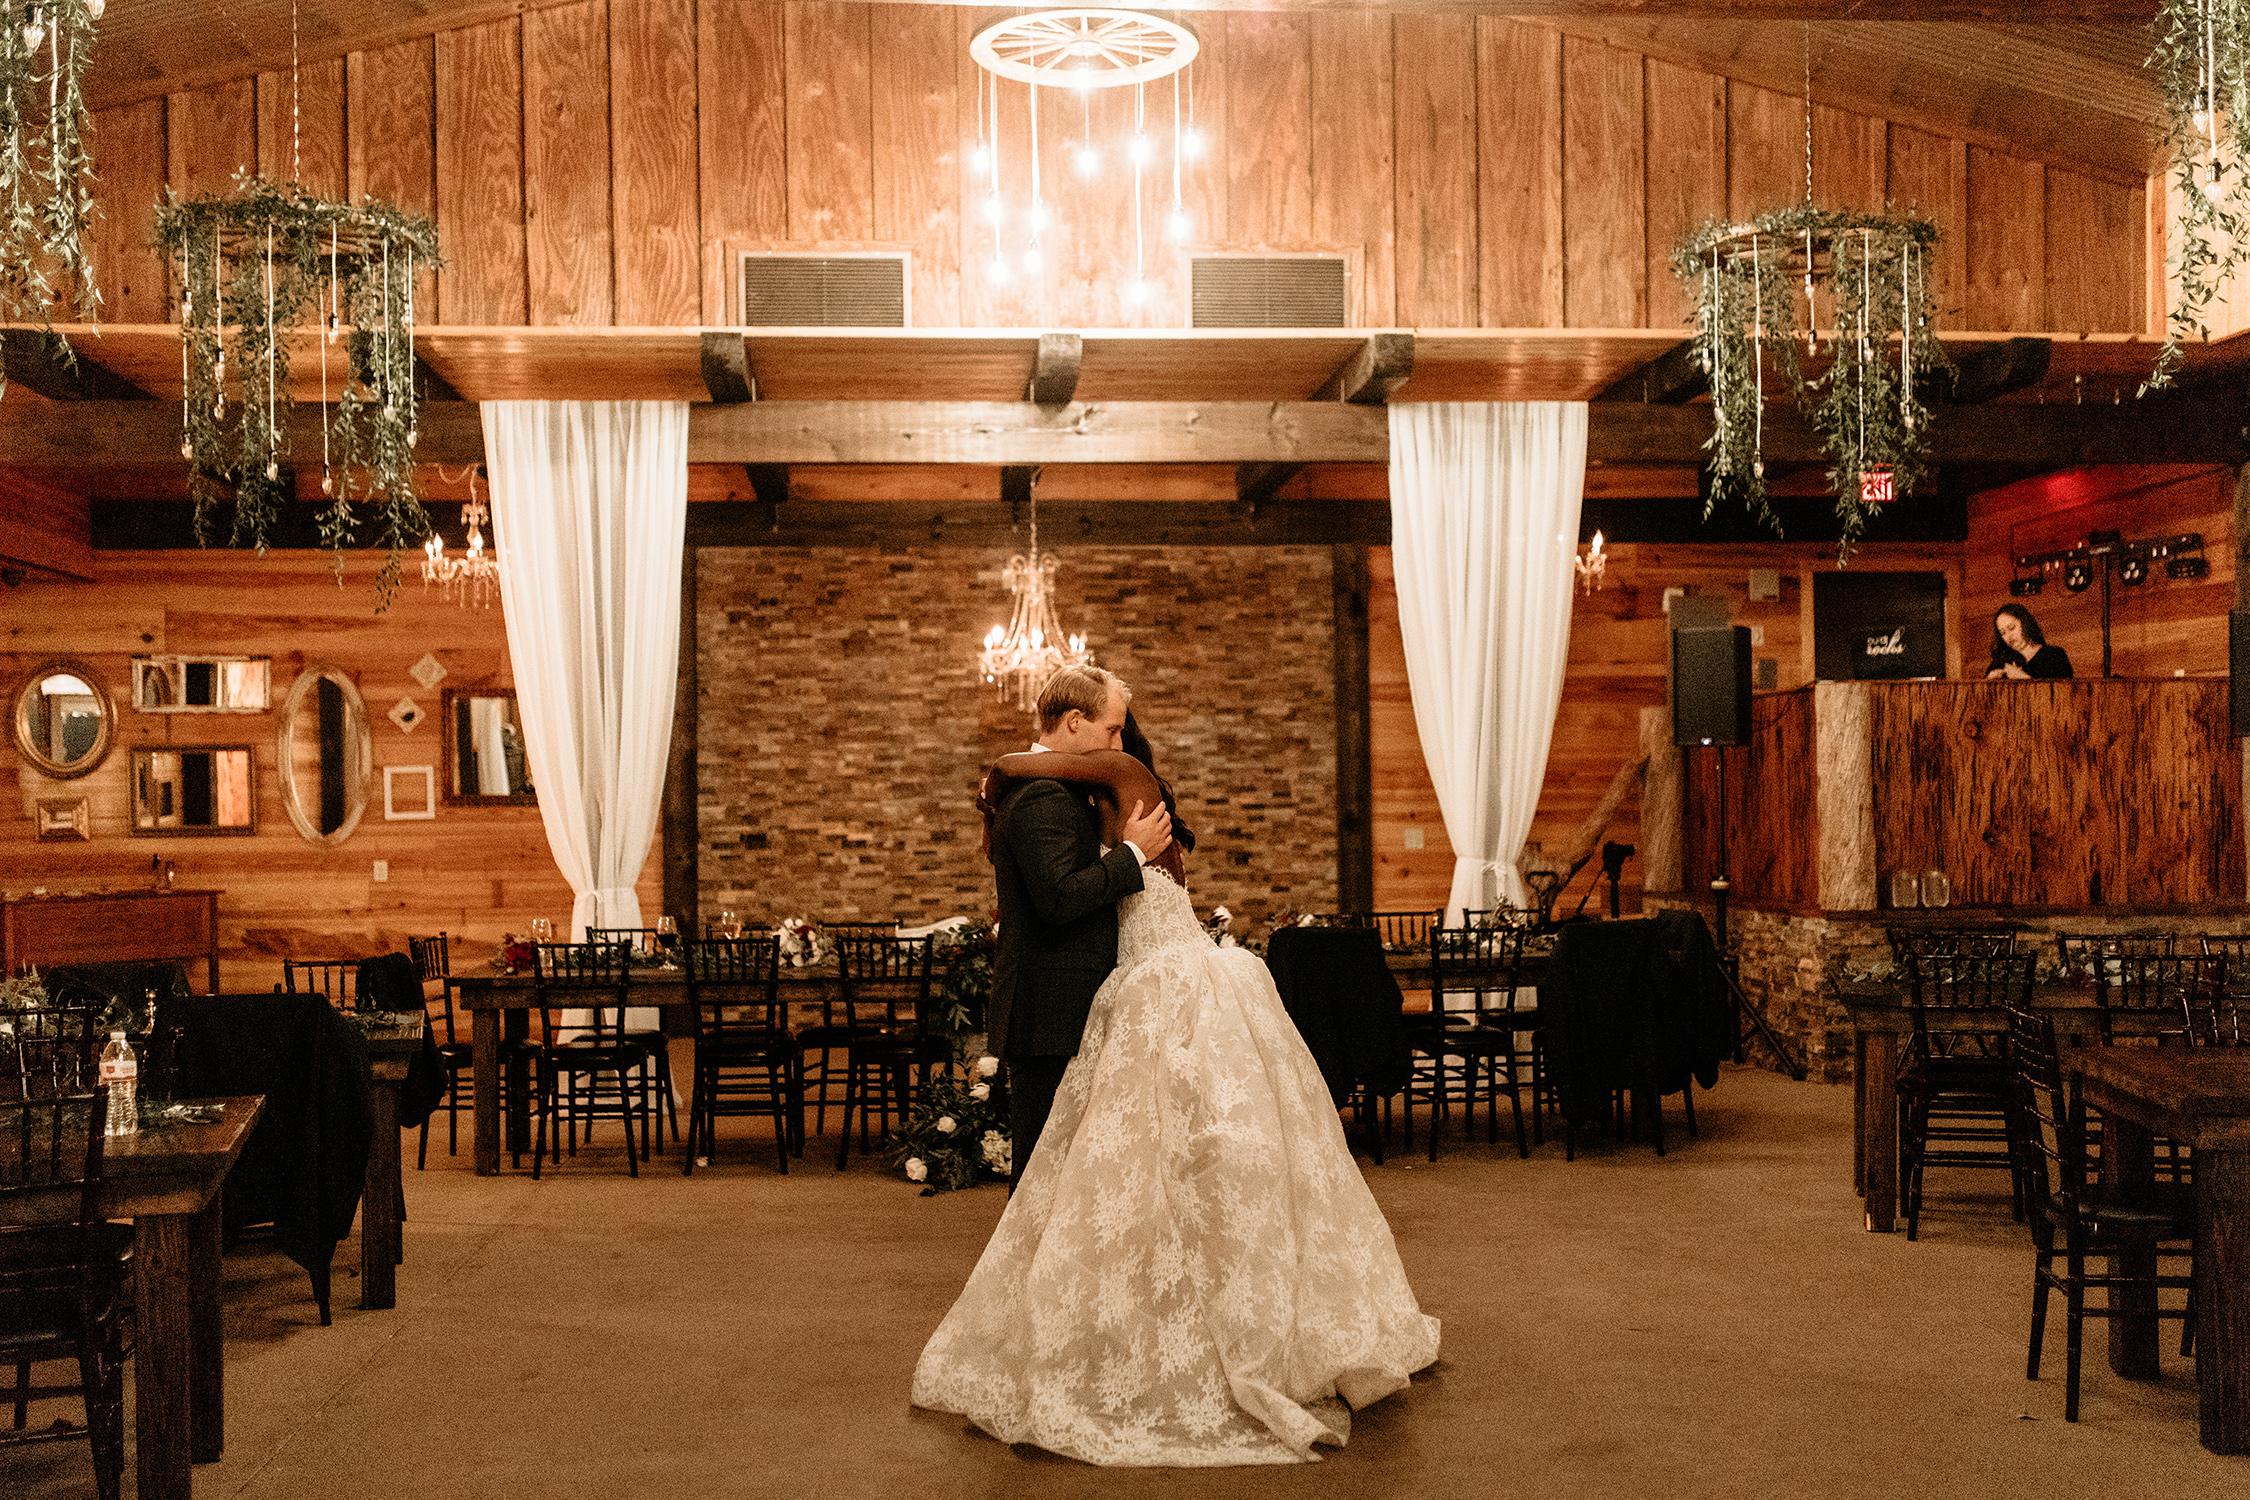 aerielle dyan wedding couple private moment